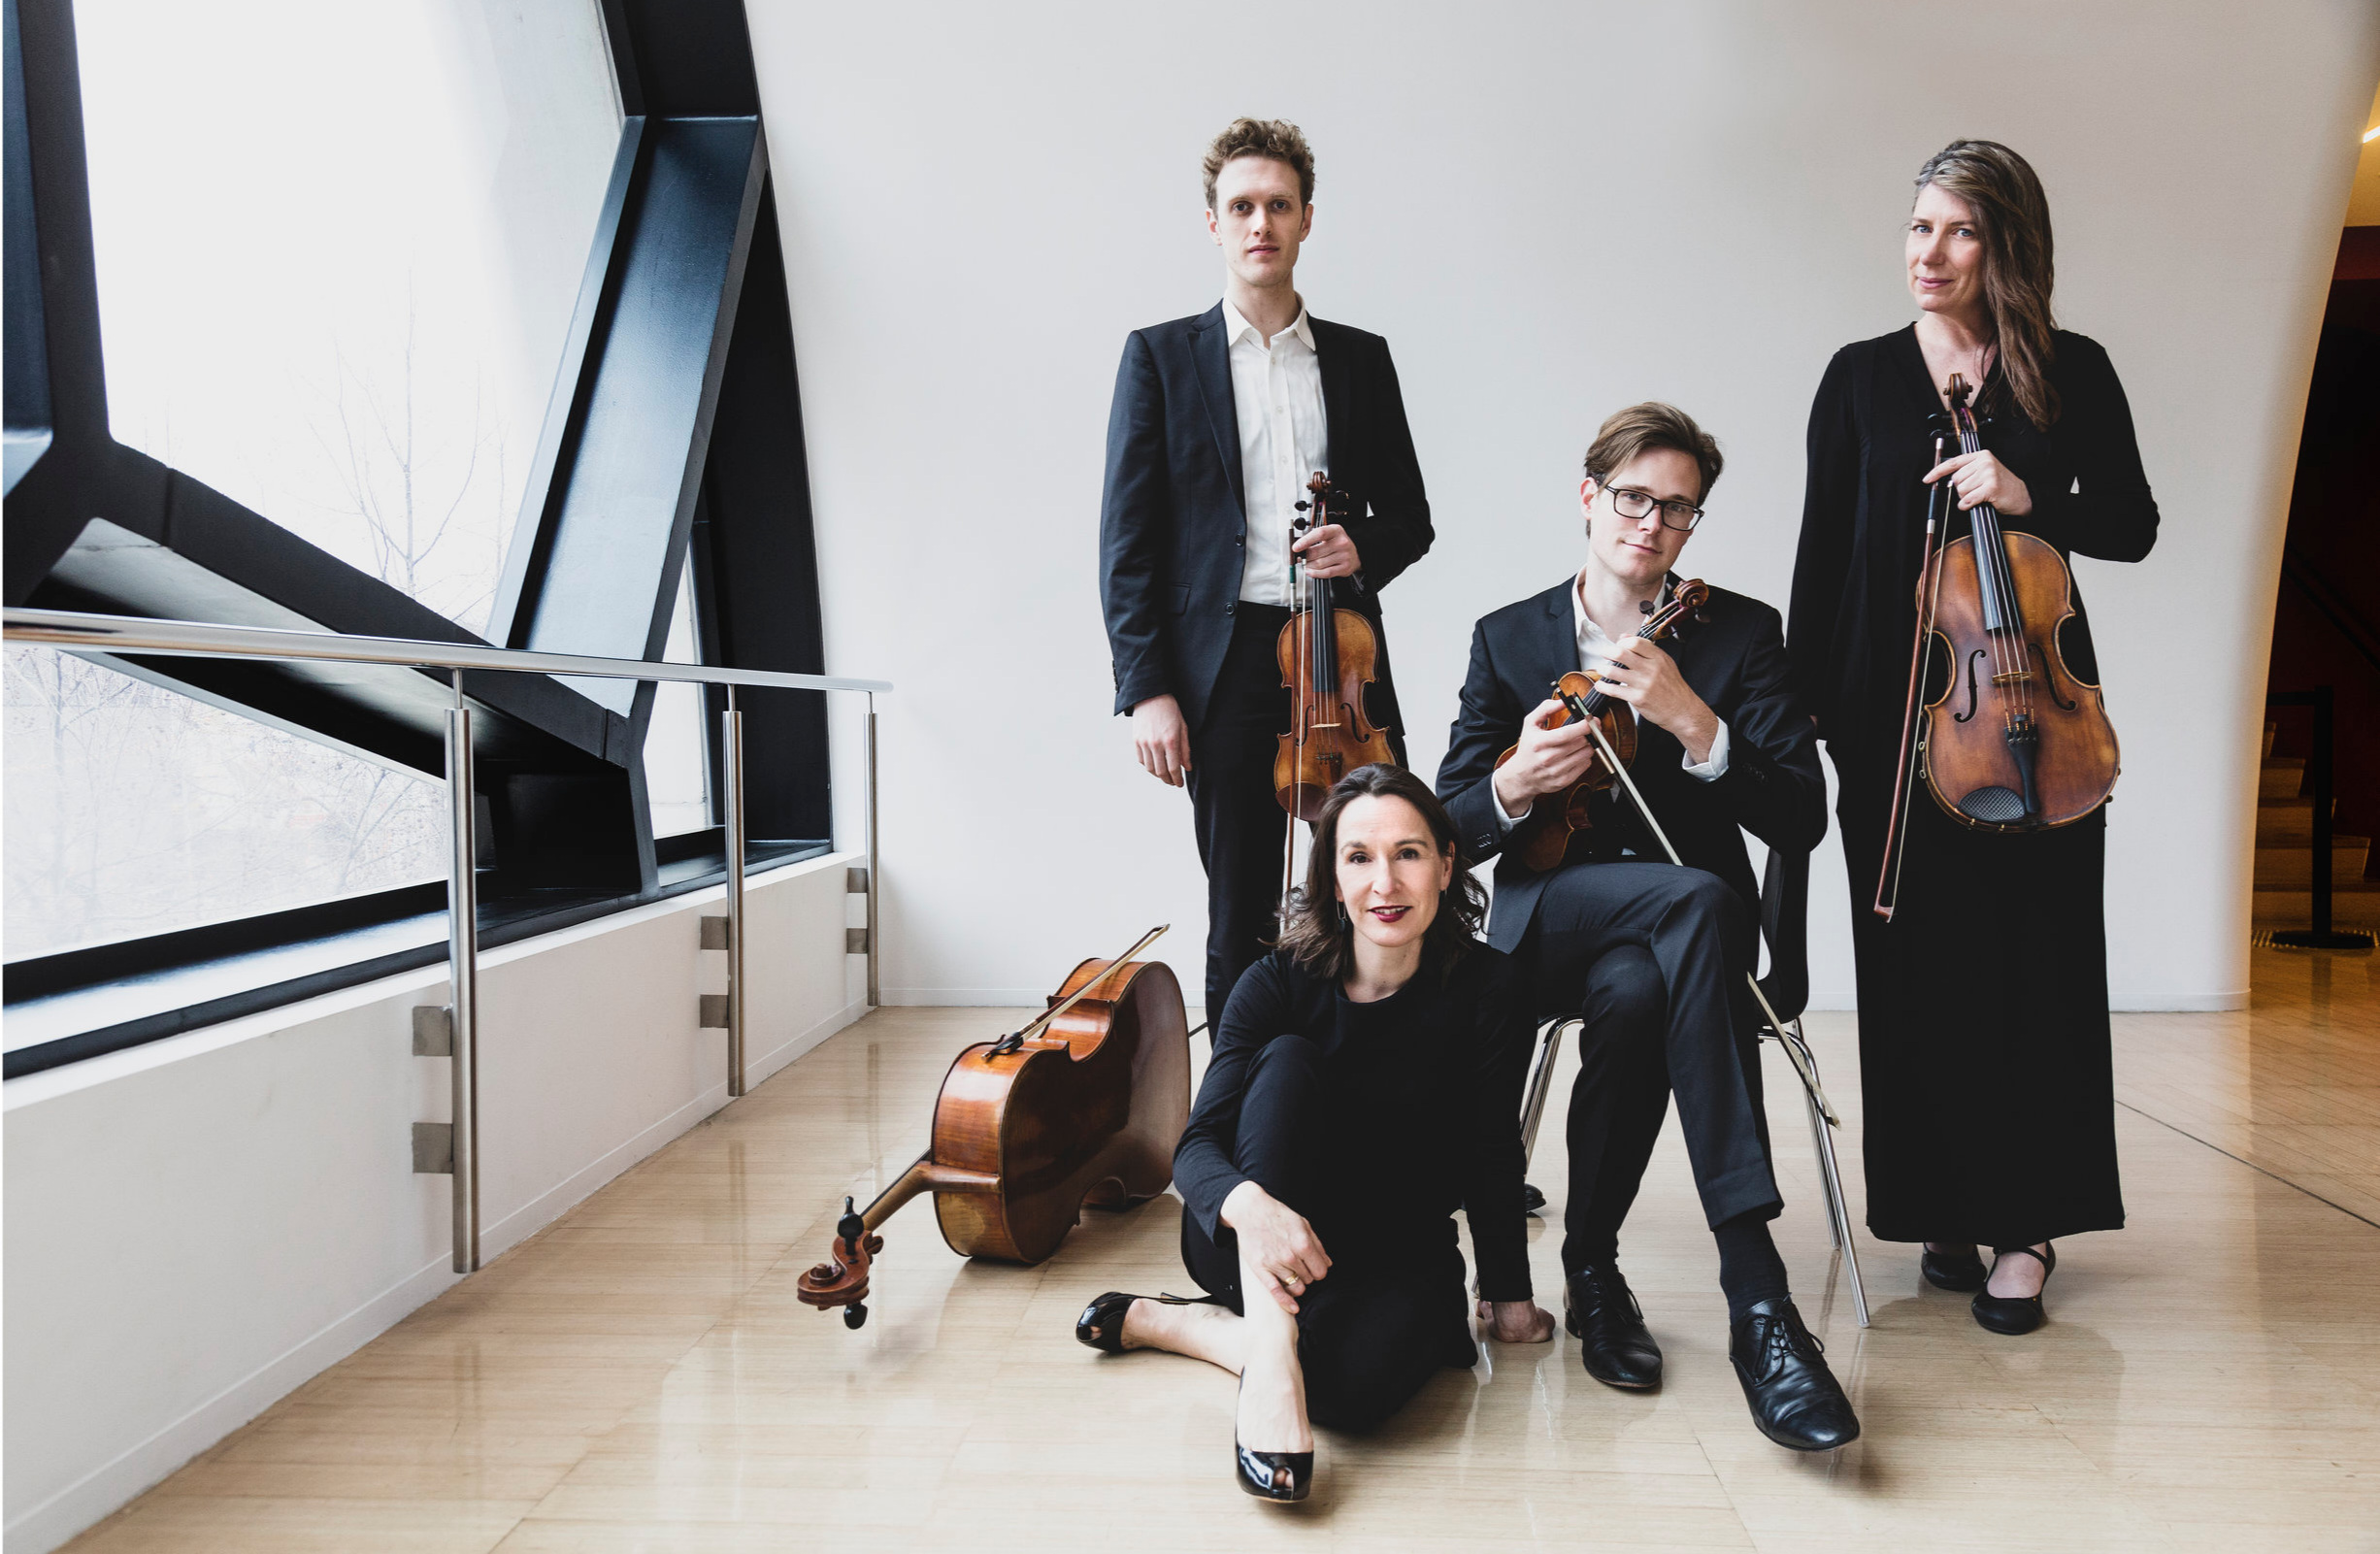 Nicholas Waters (violin), Zoe Knighton (cello), Thibaud Pavlovic-Hobba (violin), Helen Ireland (viola)  Photo credit:  Pia Johnson